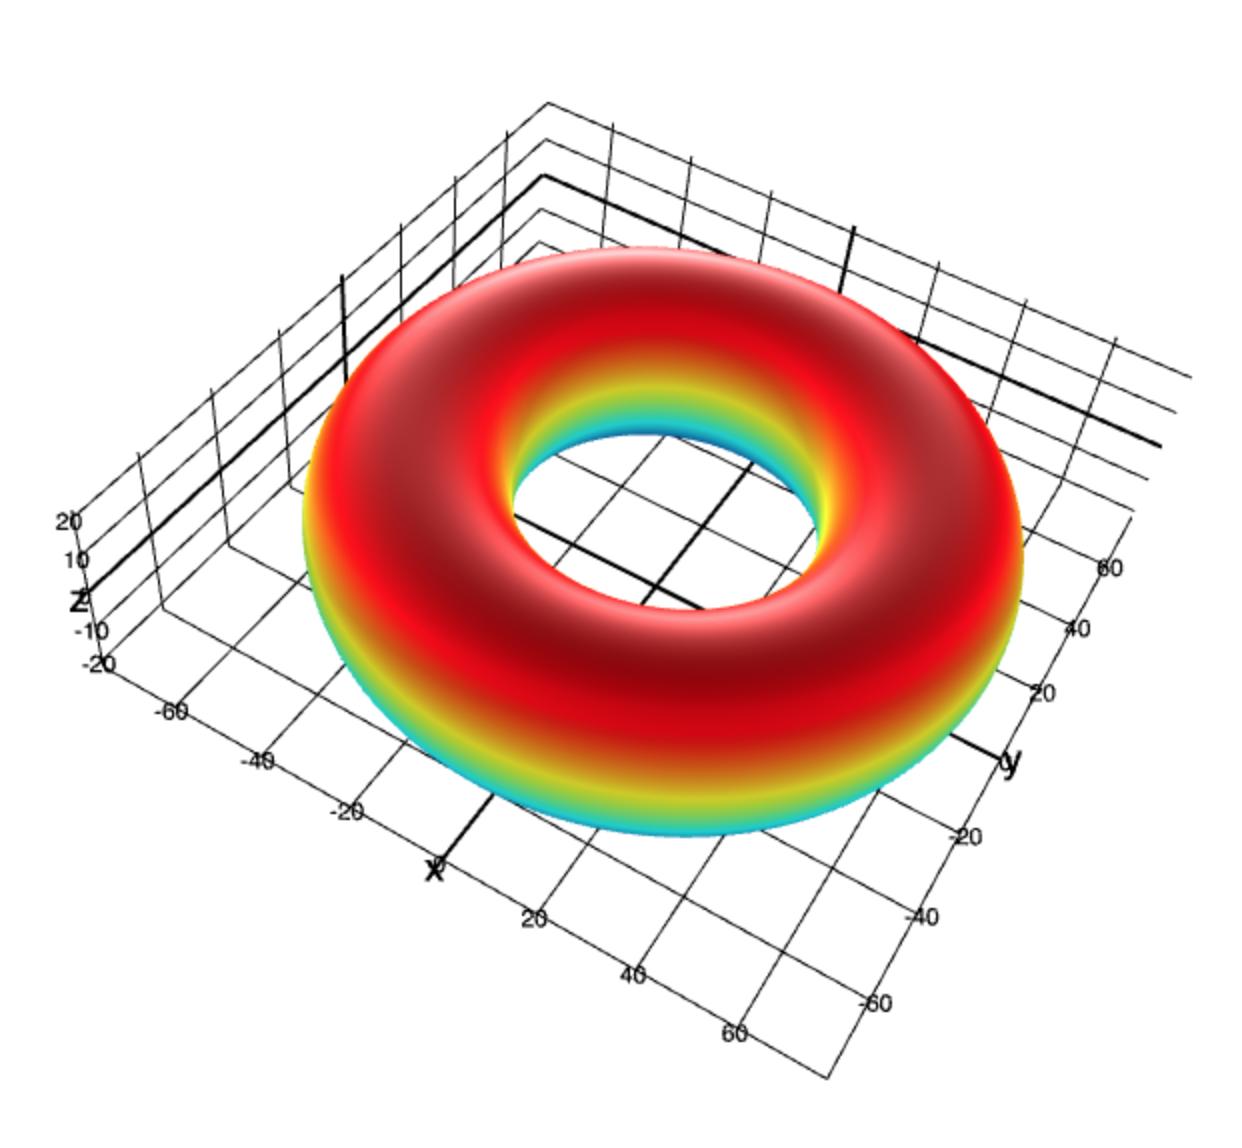 3D parametric surface plot